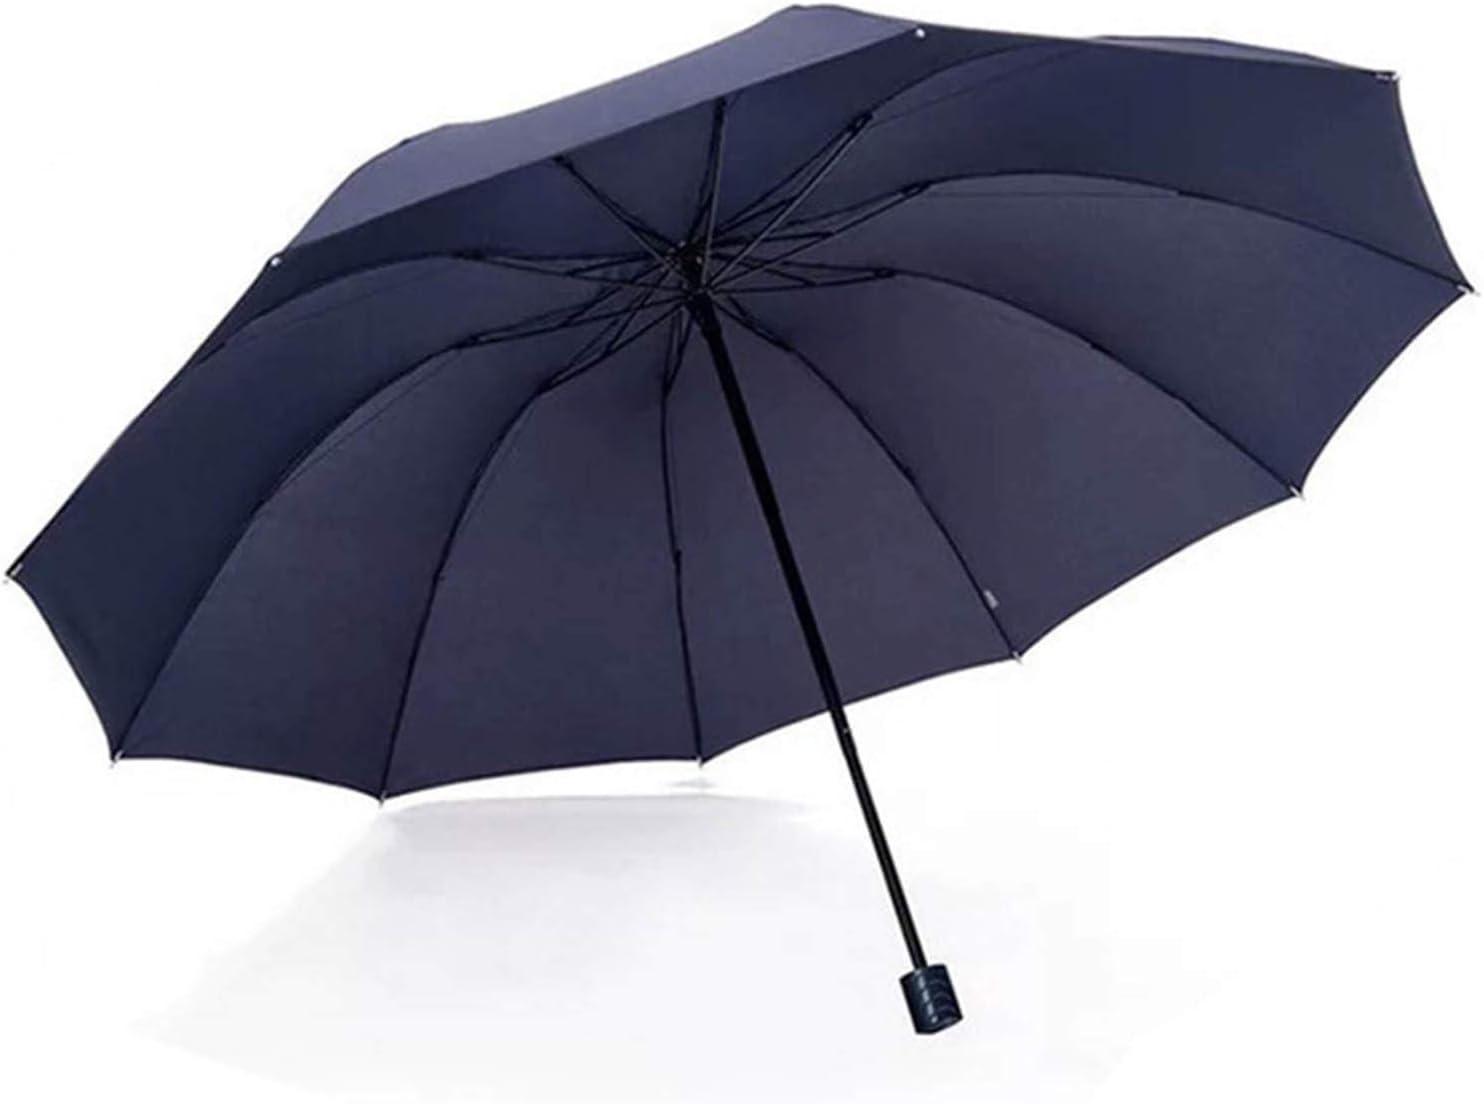 wfycw Windproof Travel Ranking TOP7 New item Umbrella Compact Folding Autom